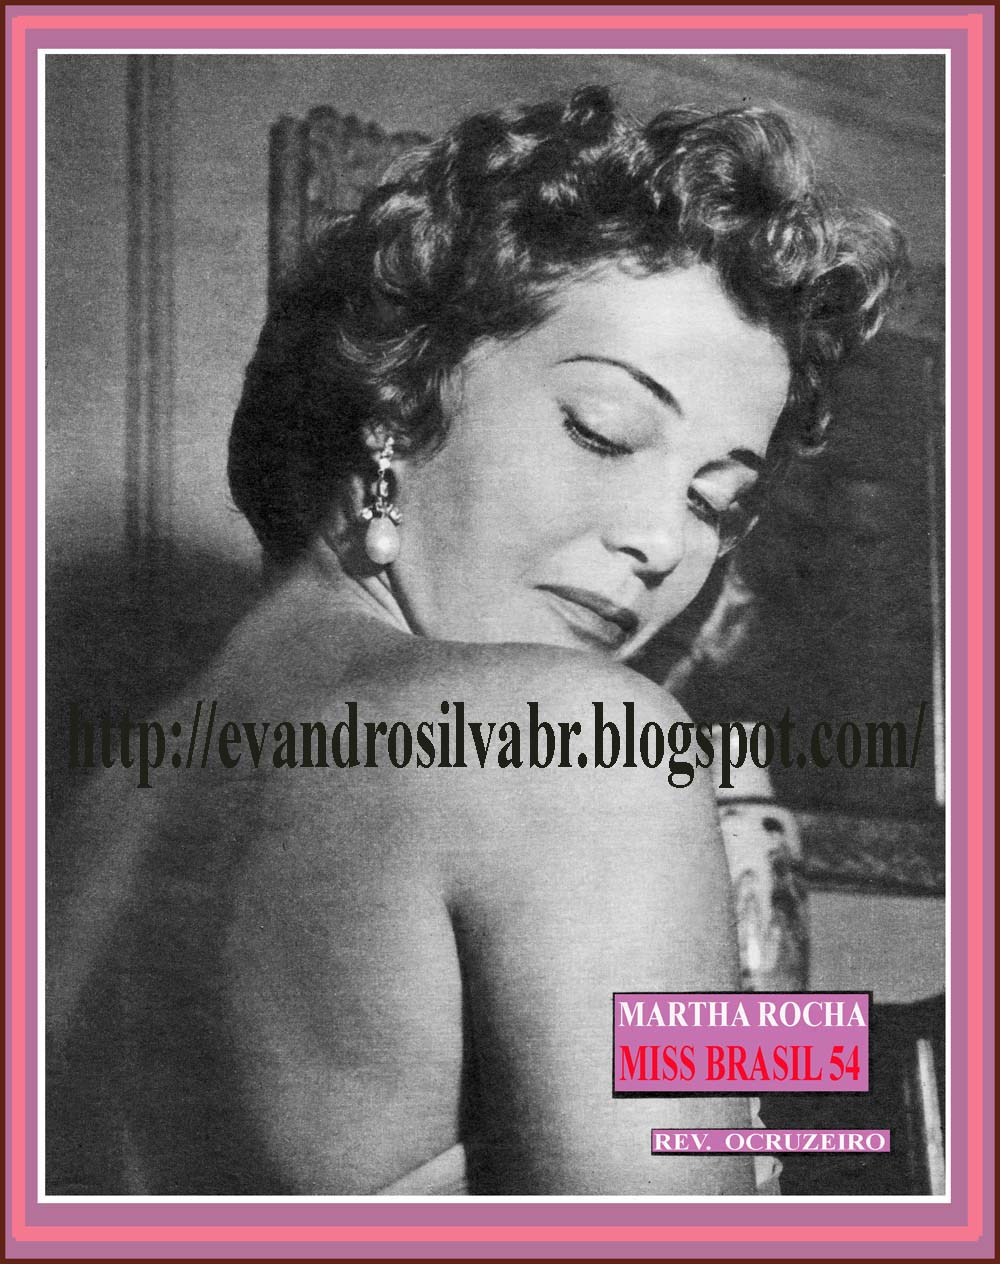 martha rocha, top 2 de miss universe 1954. primeira brasileira a participar de miss universe.†  - Página 2 Vintag10